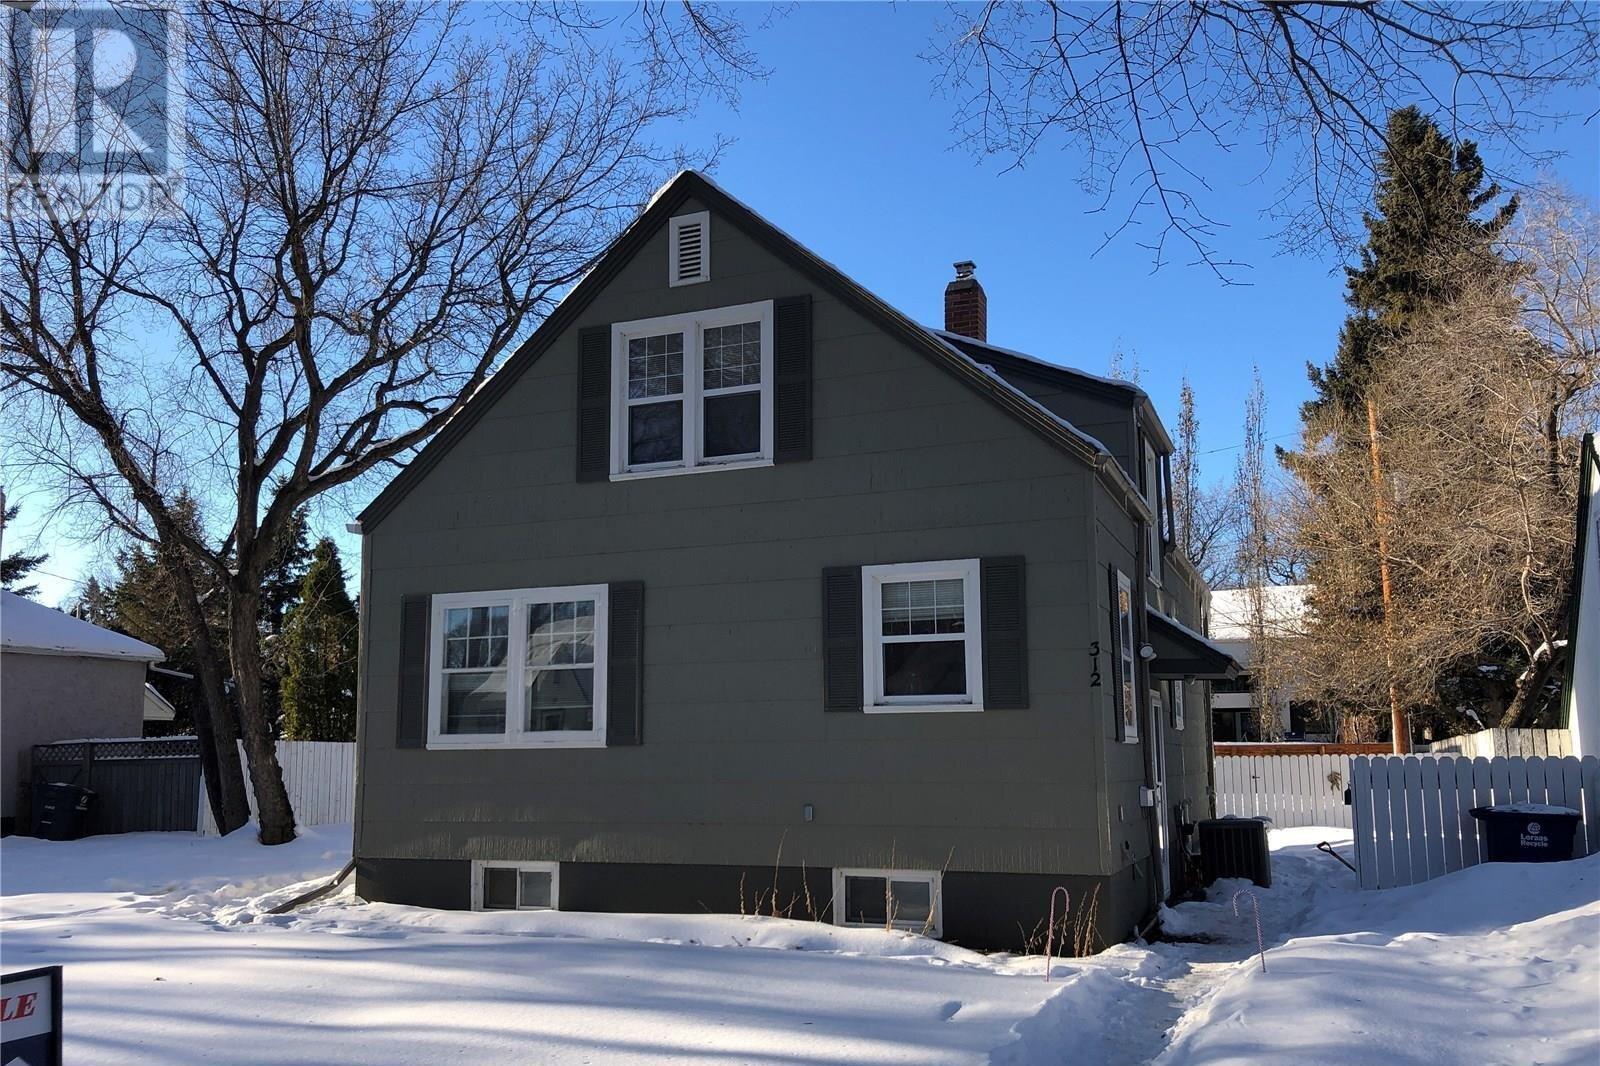 House for sale at 312 Mckinnon Ave Saskatoon Saskatchewan - MLS: SK828021